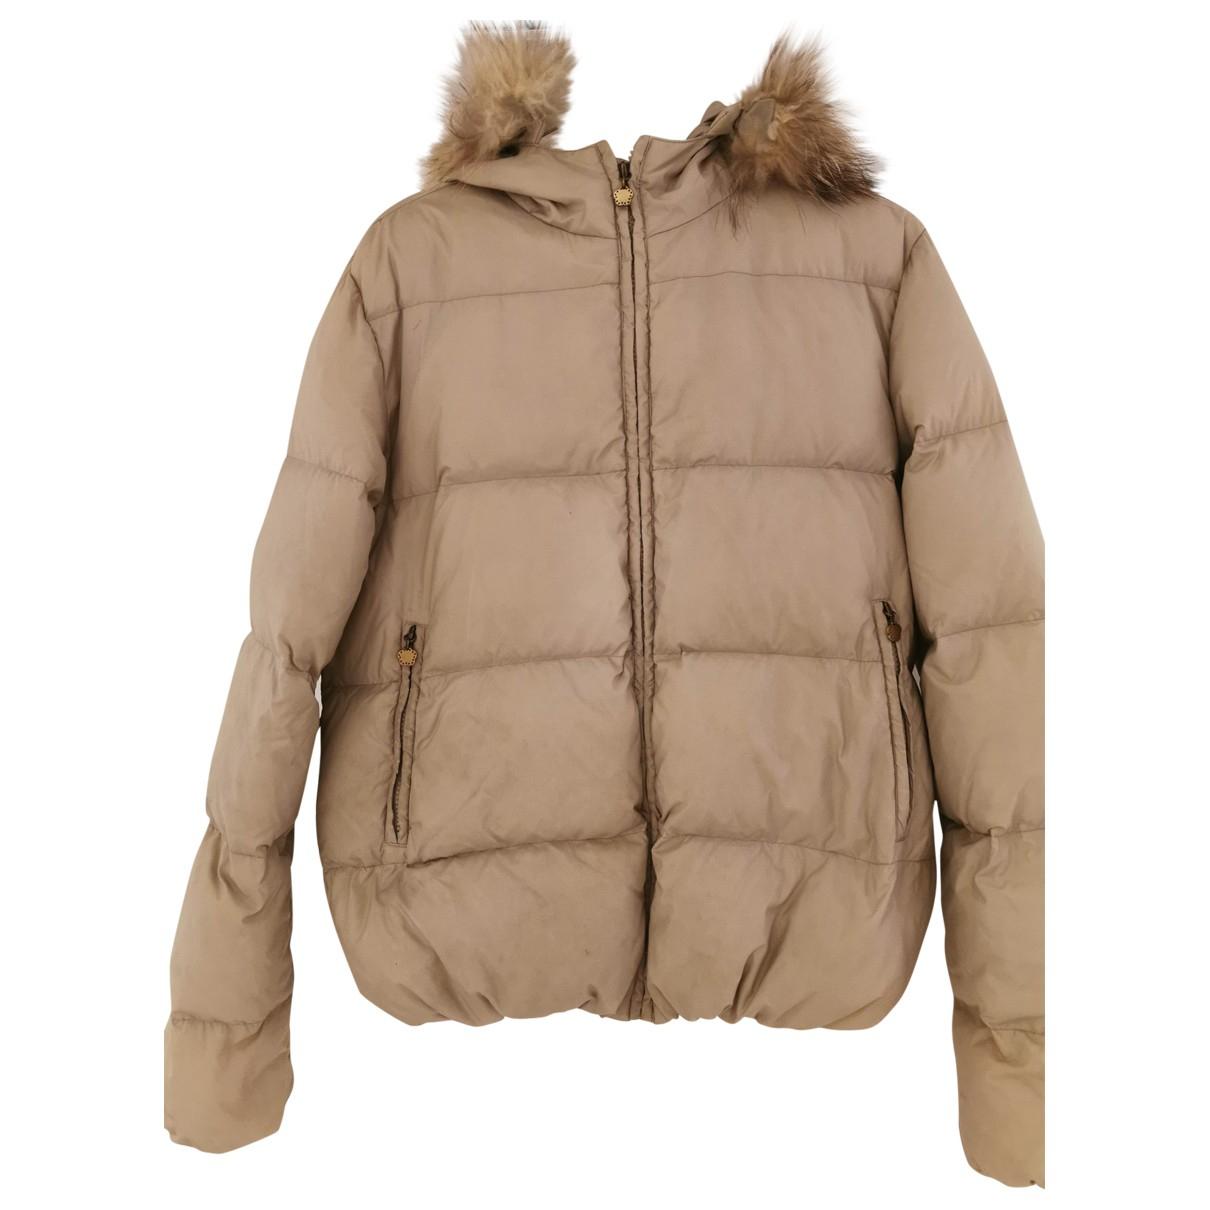 Gerard Darel \N Beige Fur jacket for Women M International